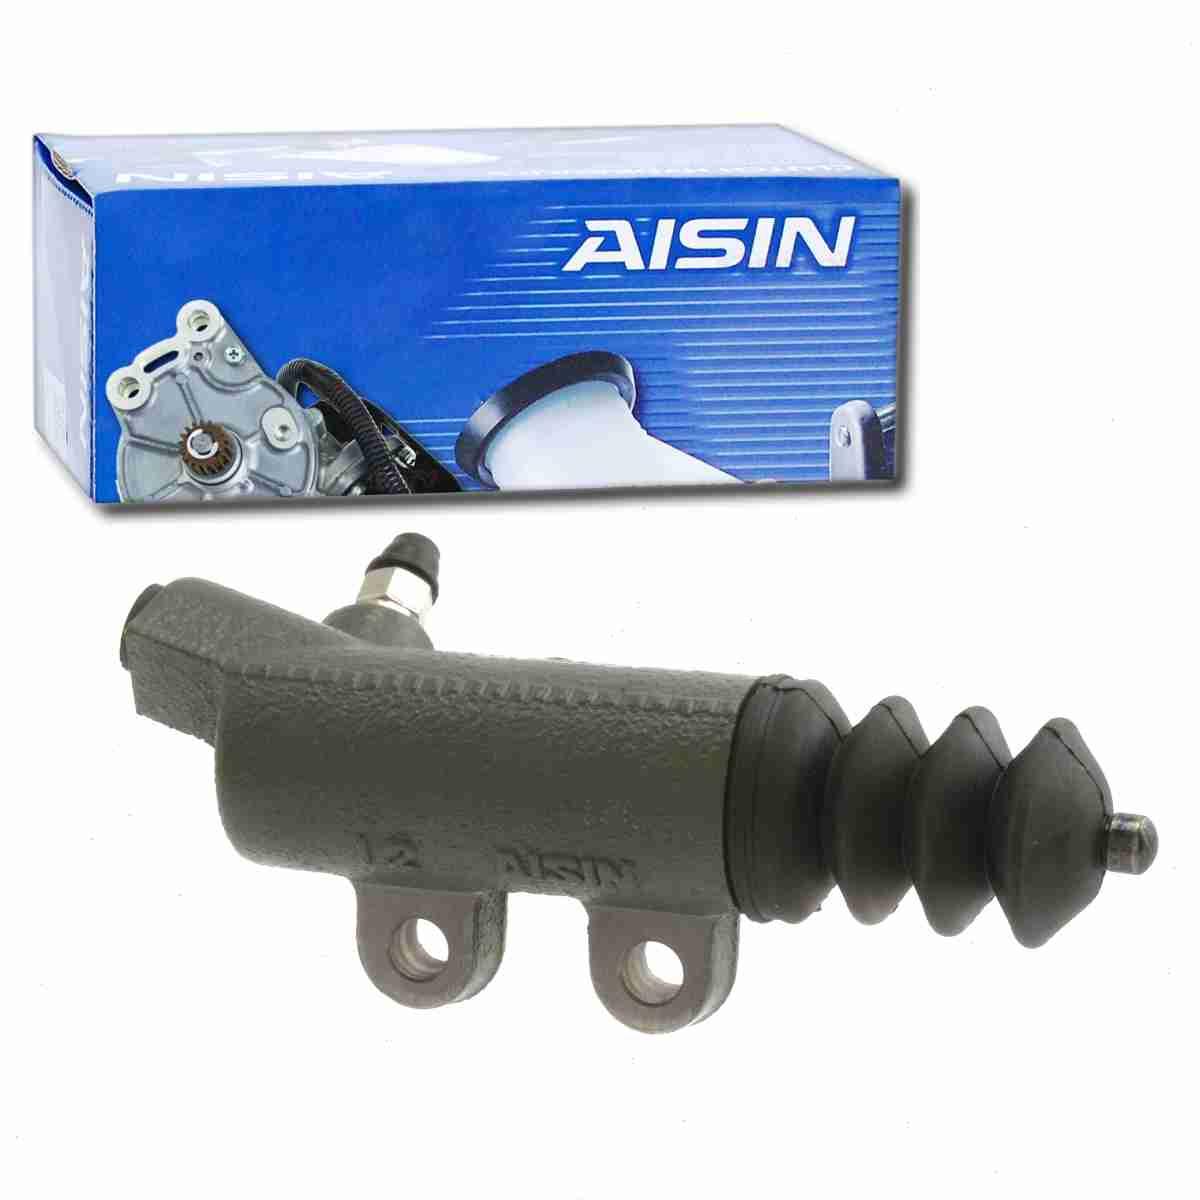 AISIN CRT-001 Clutch Slave Cylinder for 072-7917 13133 138.44404 31470-30260 vh